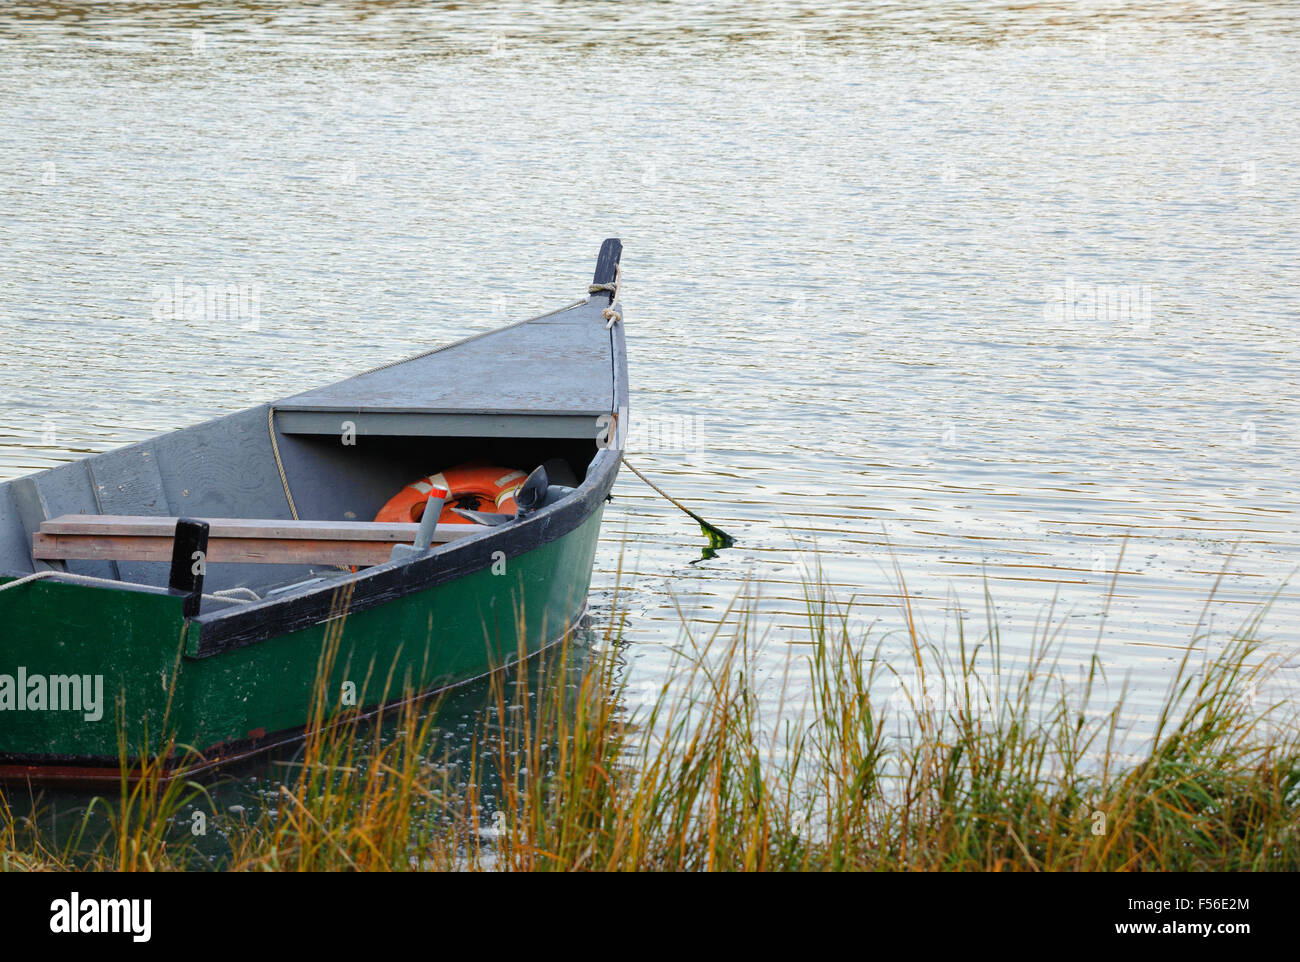 old-wooden-boat-salt-pond-eastham-cape-cod-massachusetts-usa-in-the-F56E2M.jpg